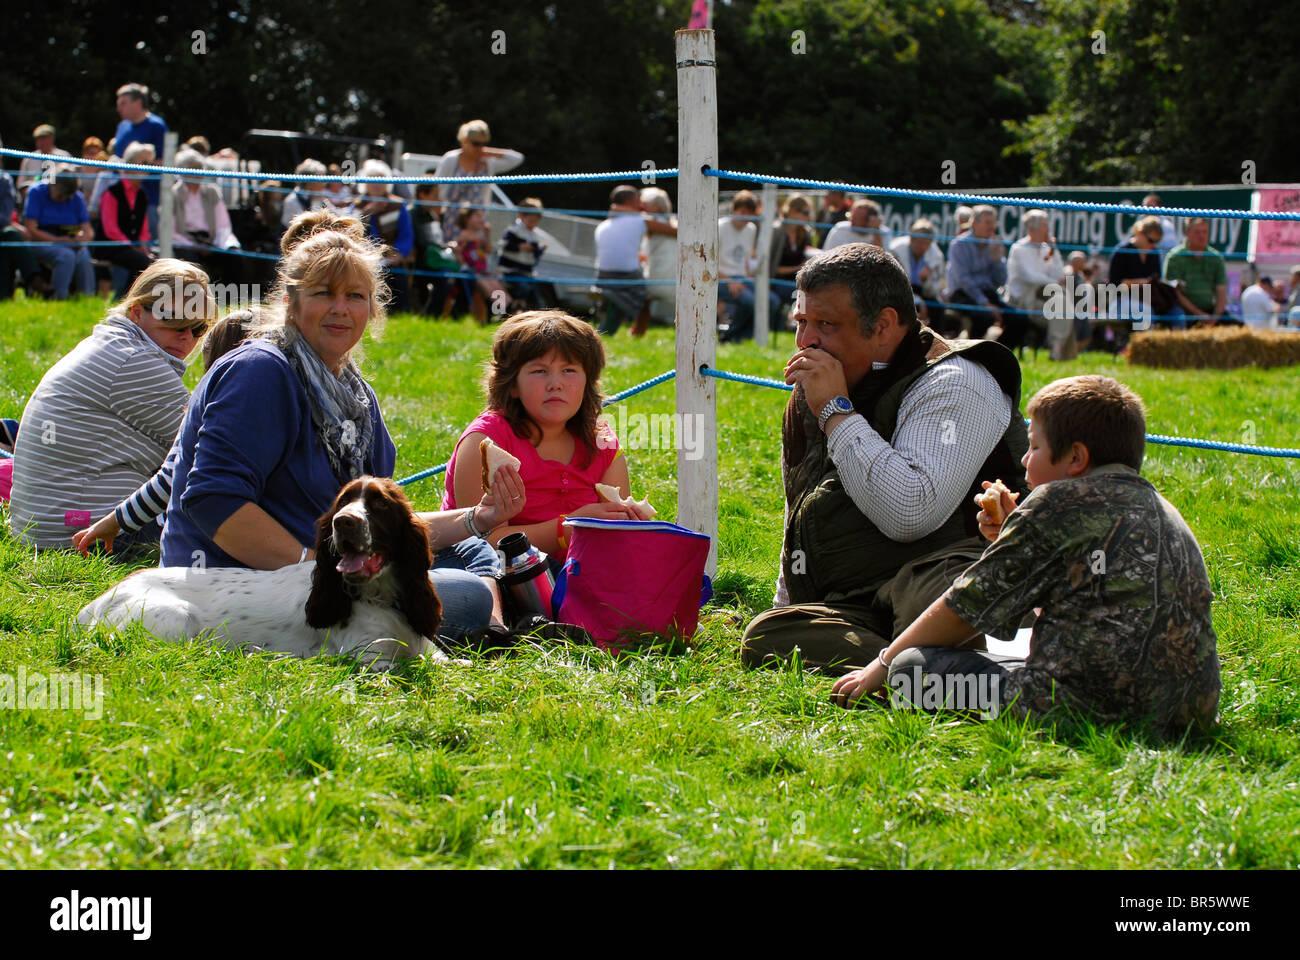 Family picnic at Hampshire County Sports Day, Alresford, Hampshire, UK. - Stock Image